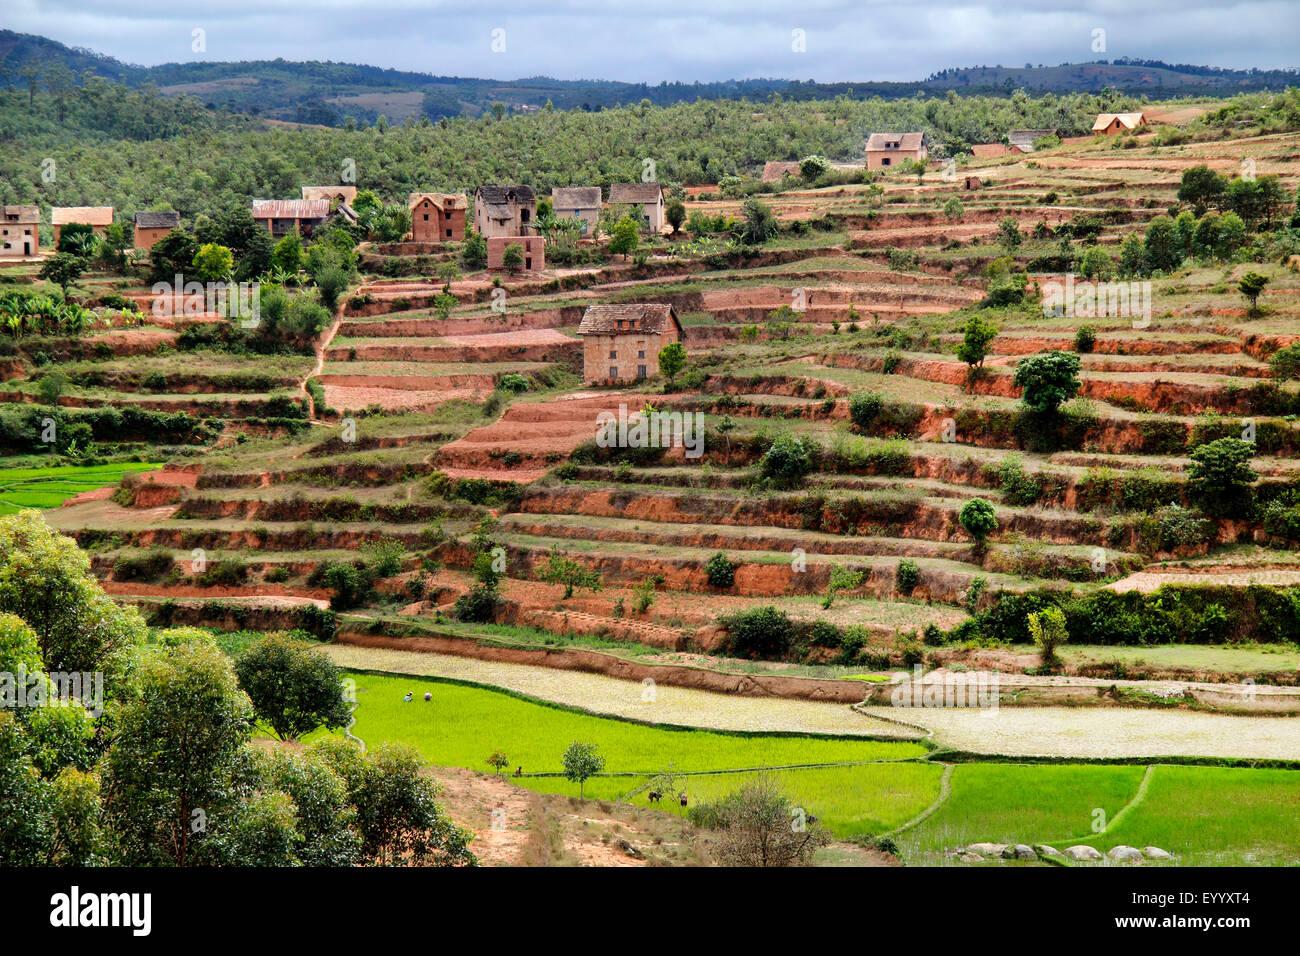 scenery with rice terraces and houses, Madagascar, Fianarantsoa - Stock Image